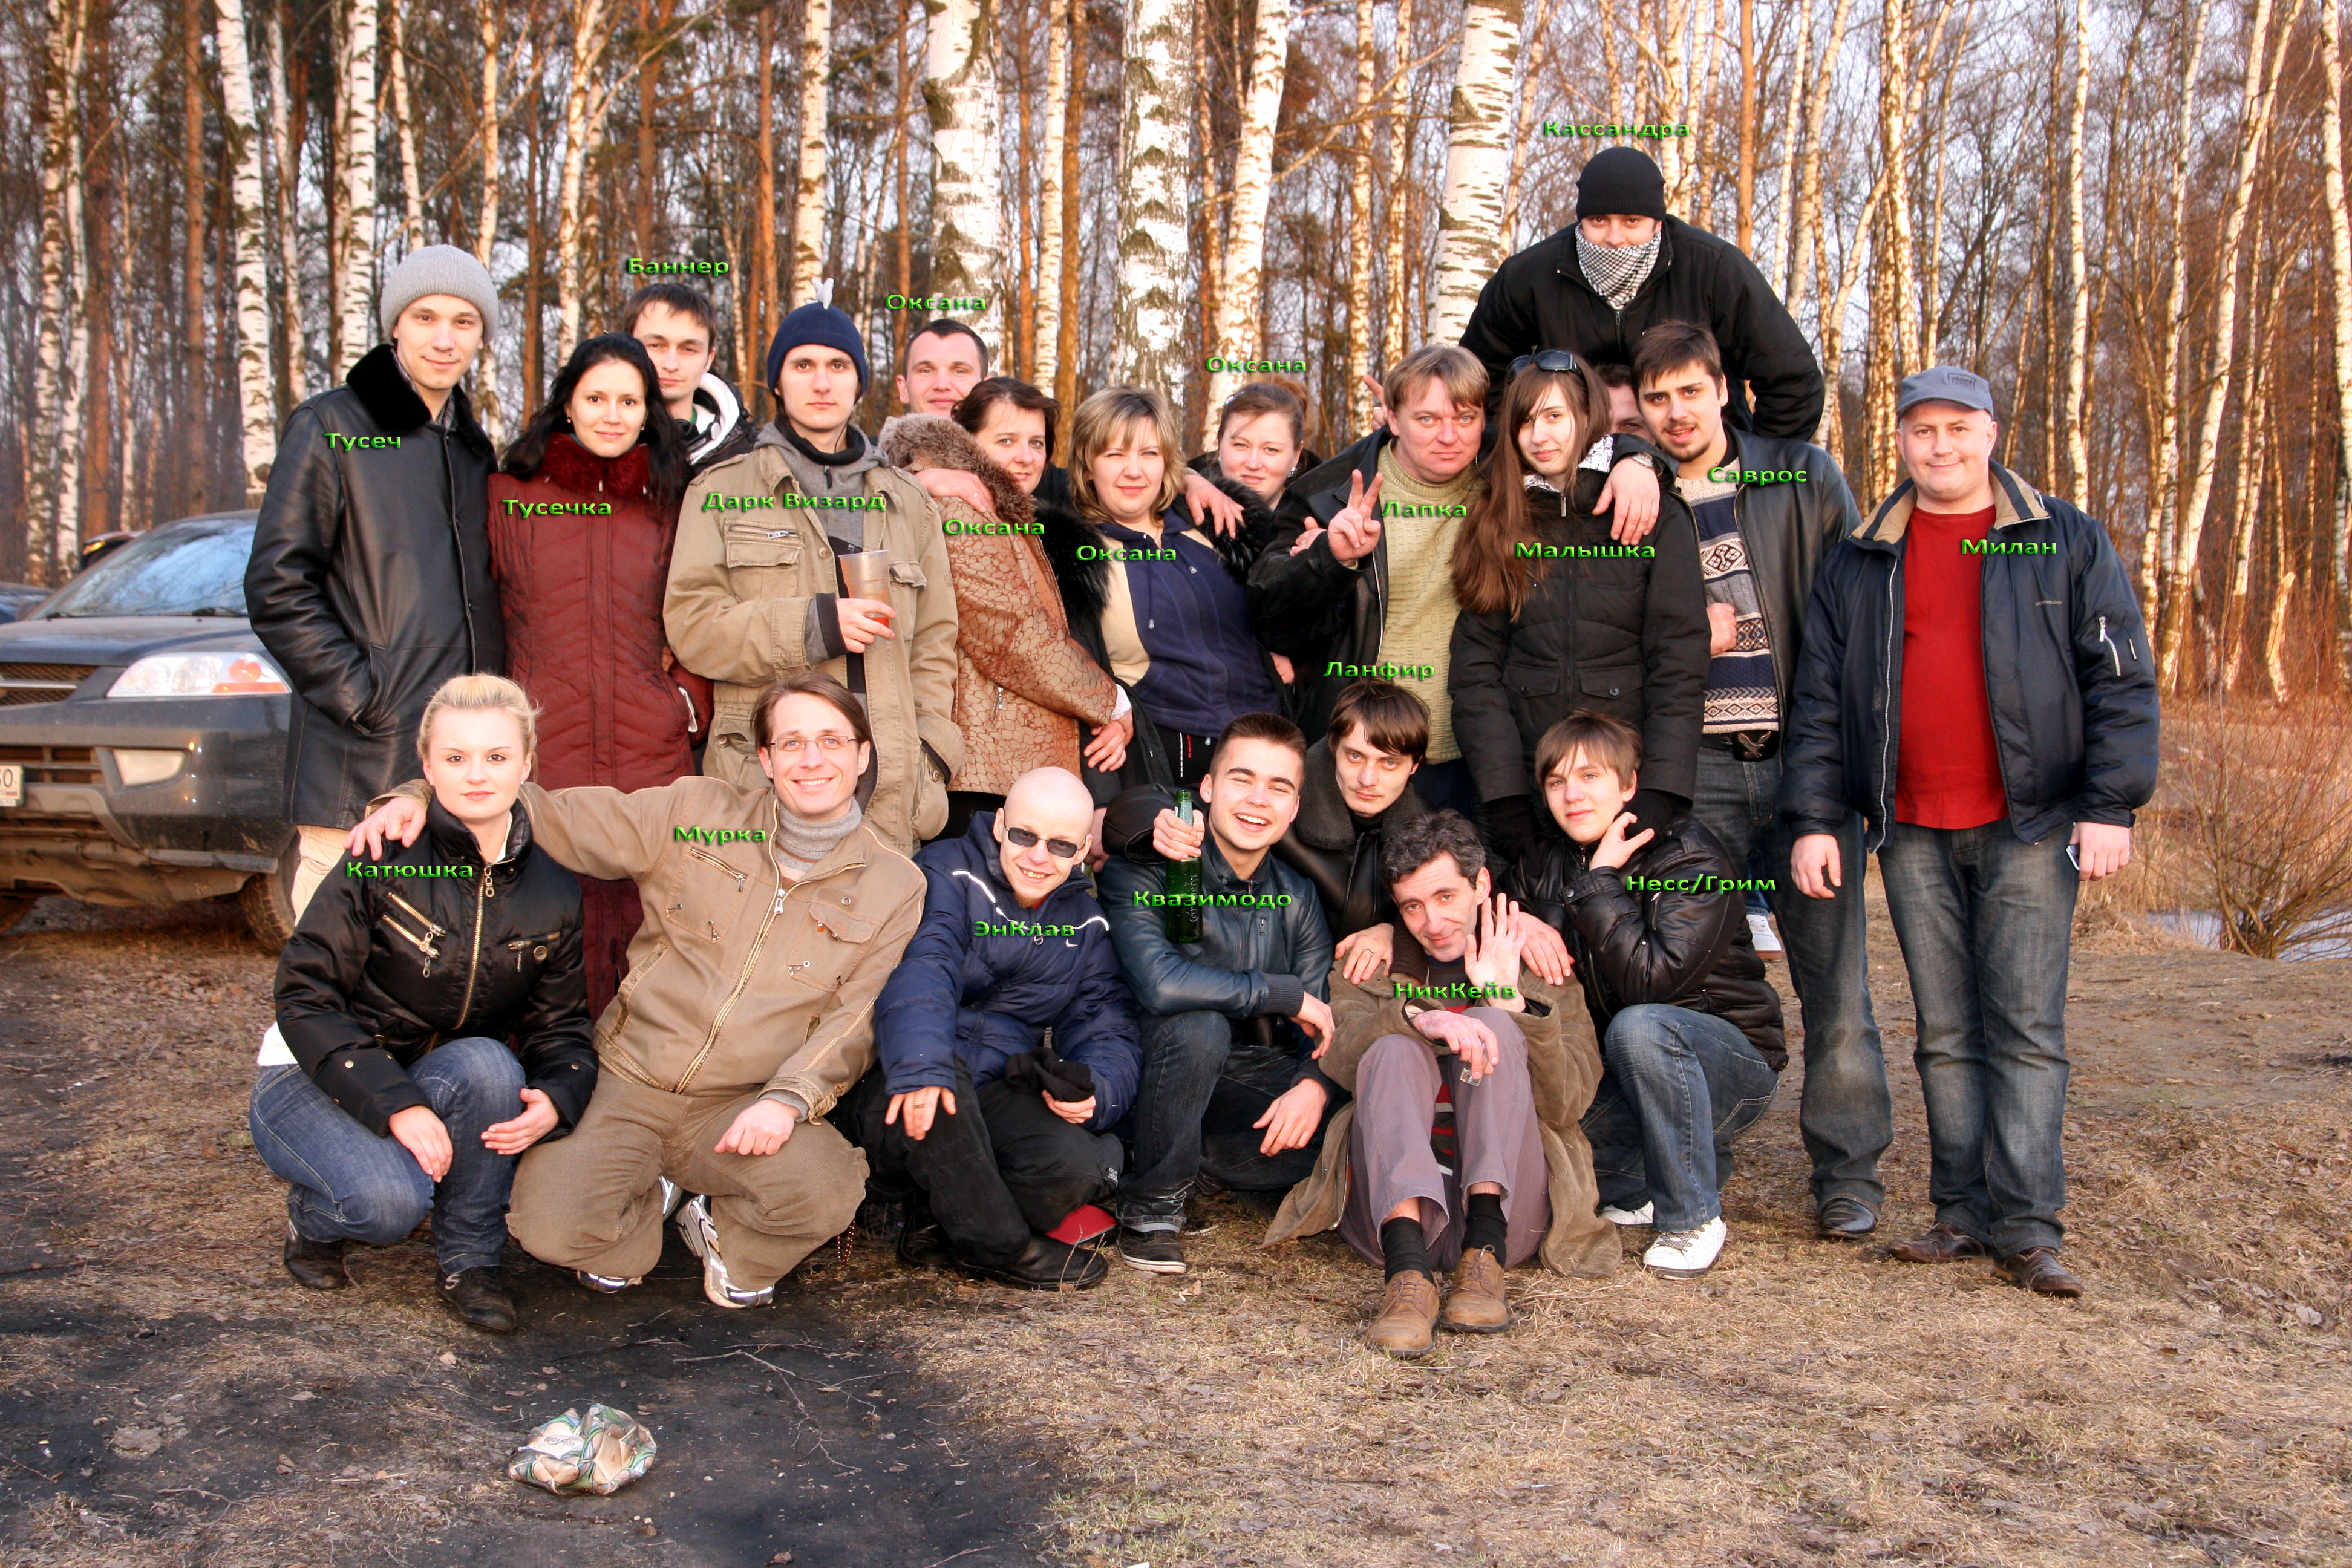 http://img-fotki.yandex.ru/get/3014/murrclan.4/0_26065_e75058a4_orig